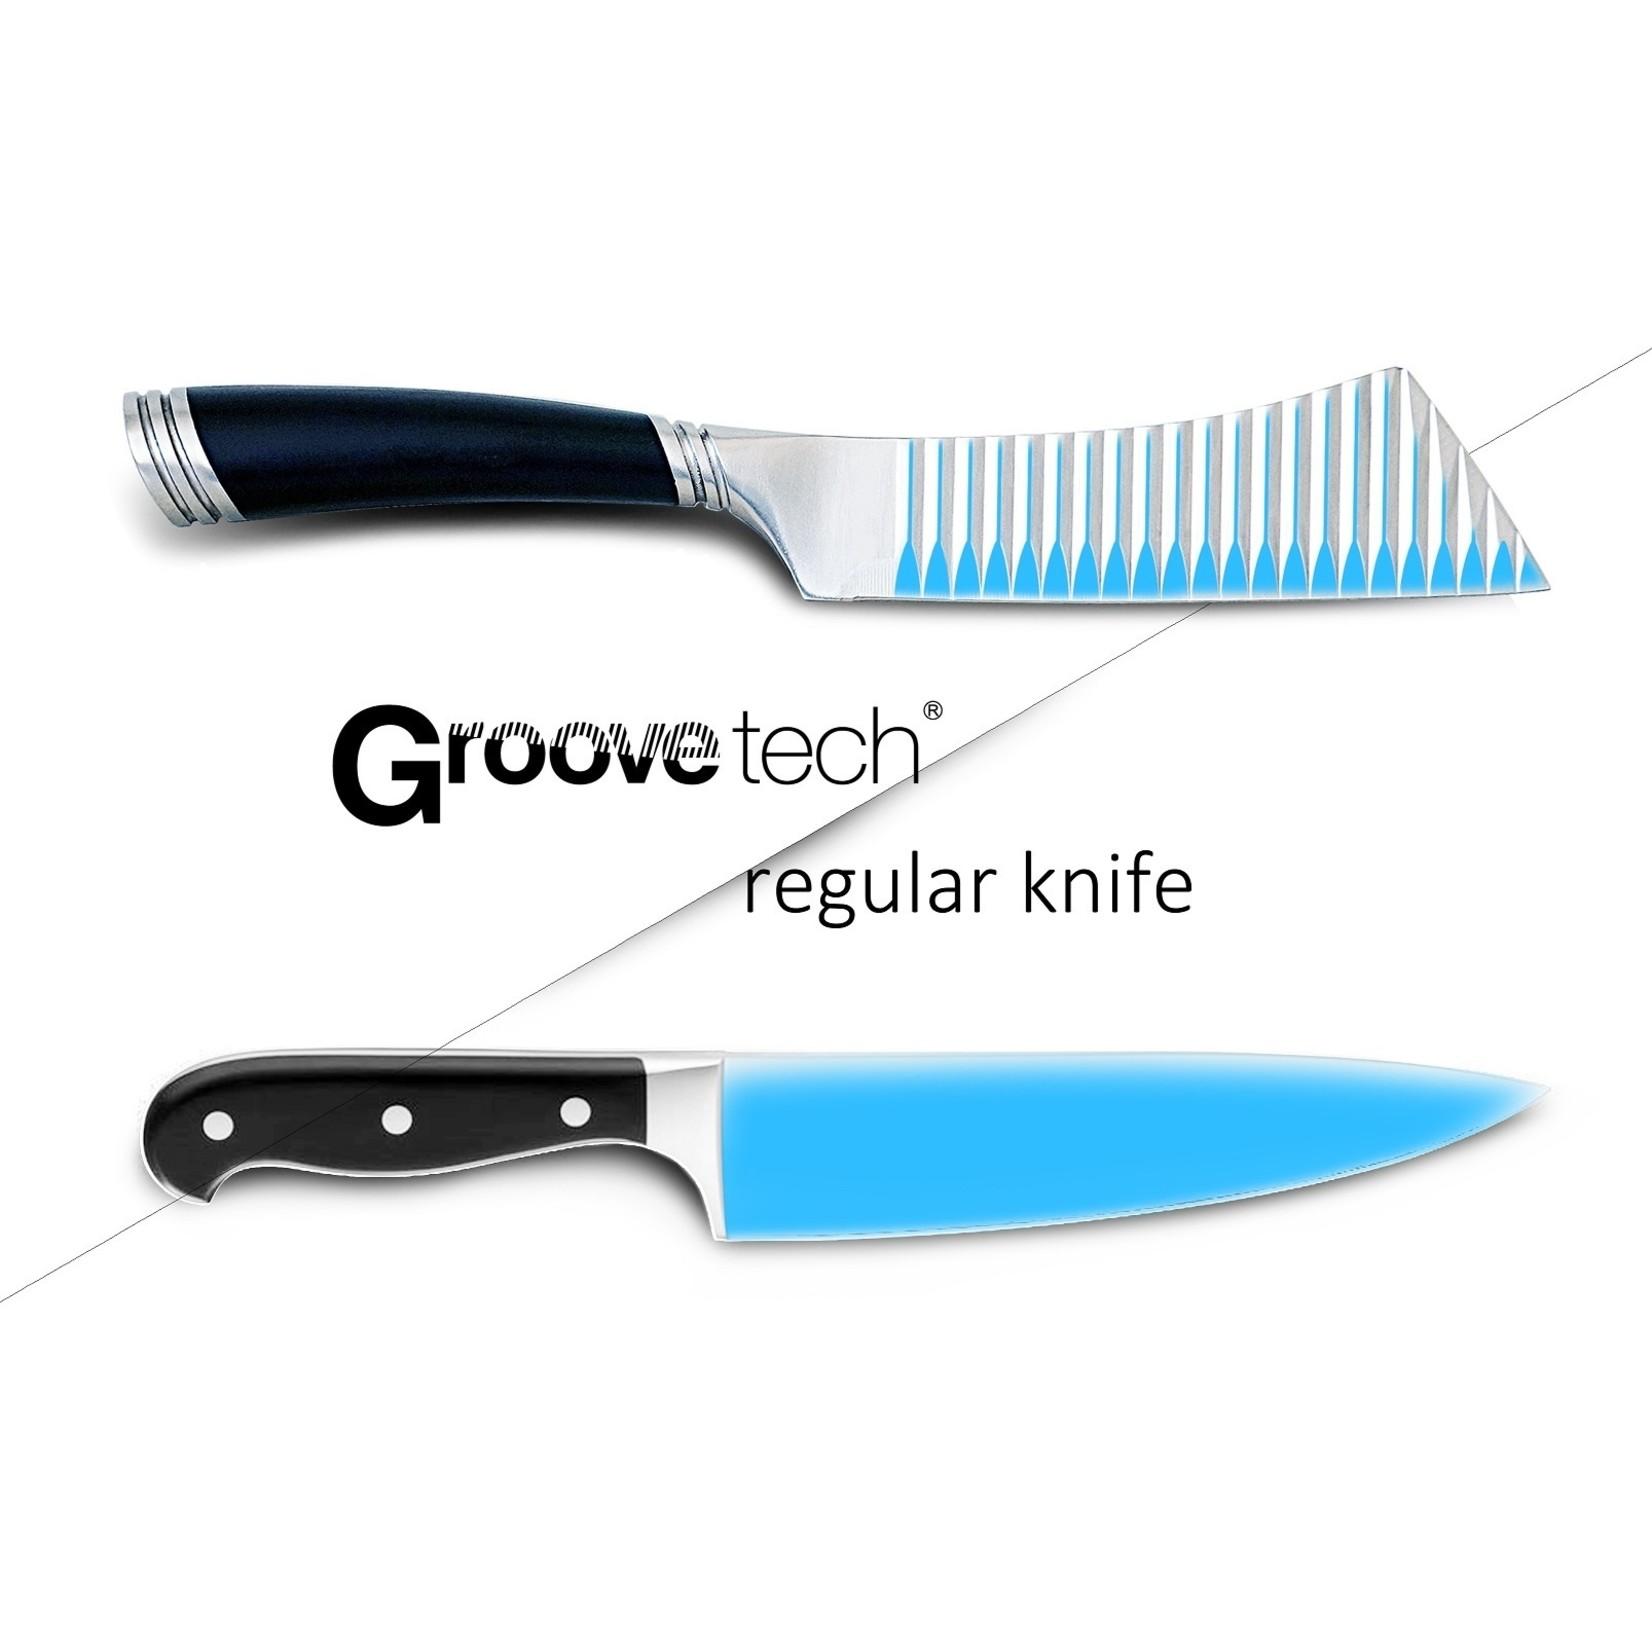 Groovetech Groovetech Universeel keukenmes 13cm